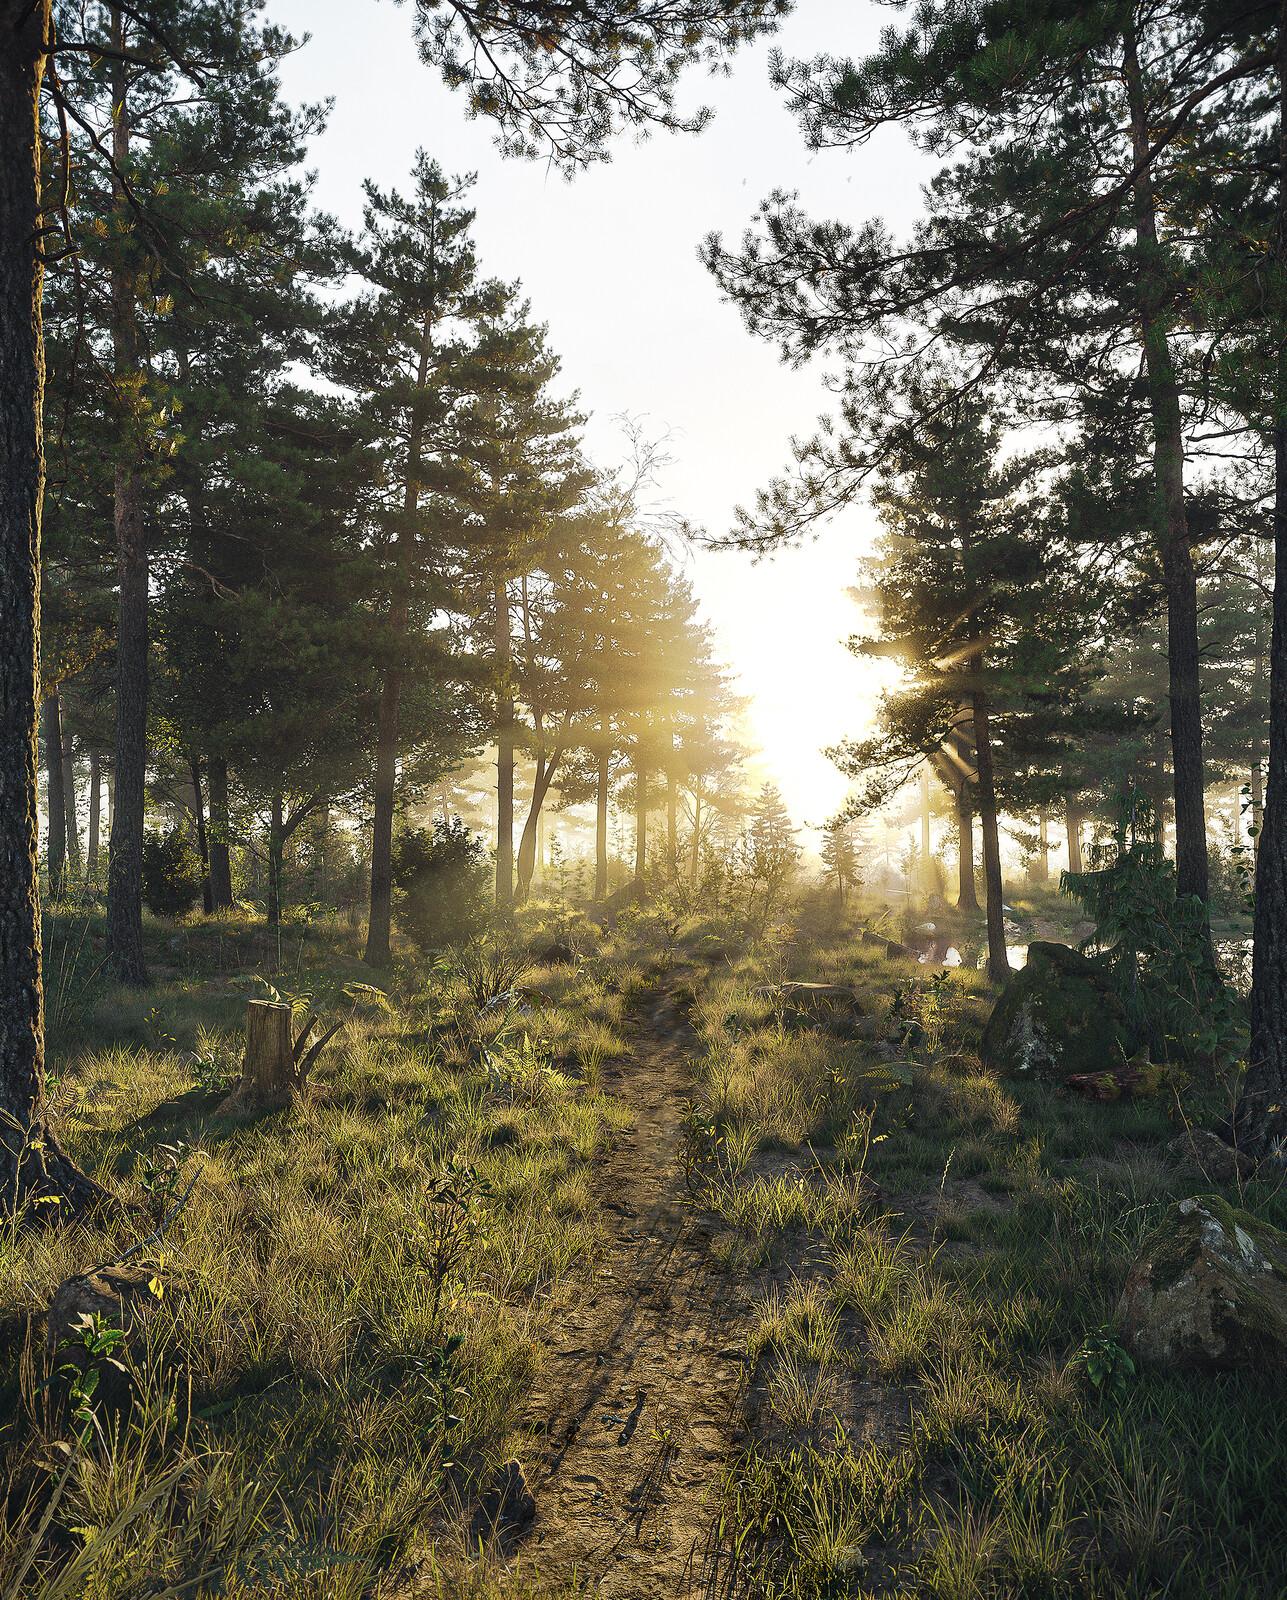 Forest001.jpeg - 100% CG